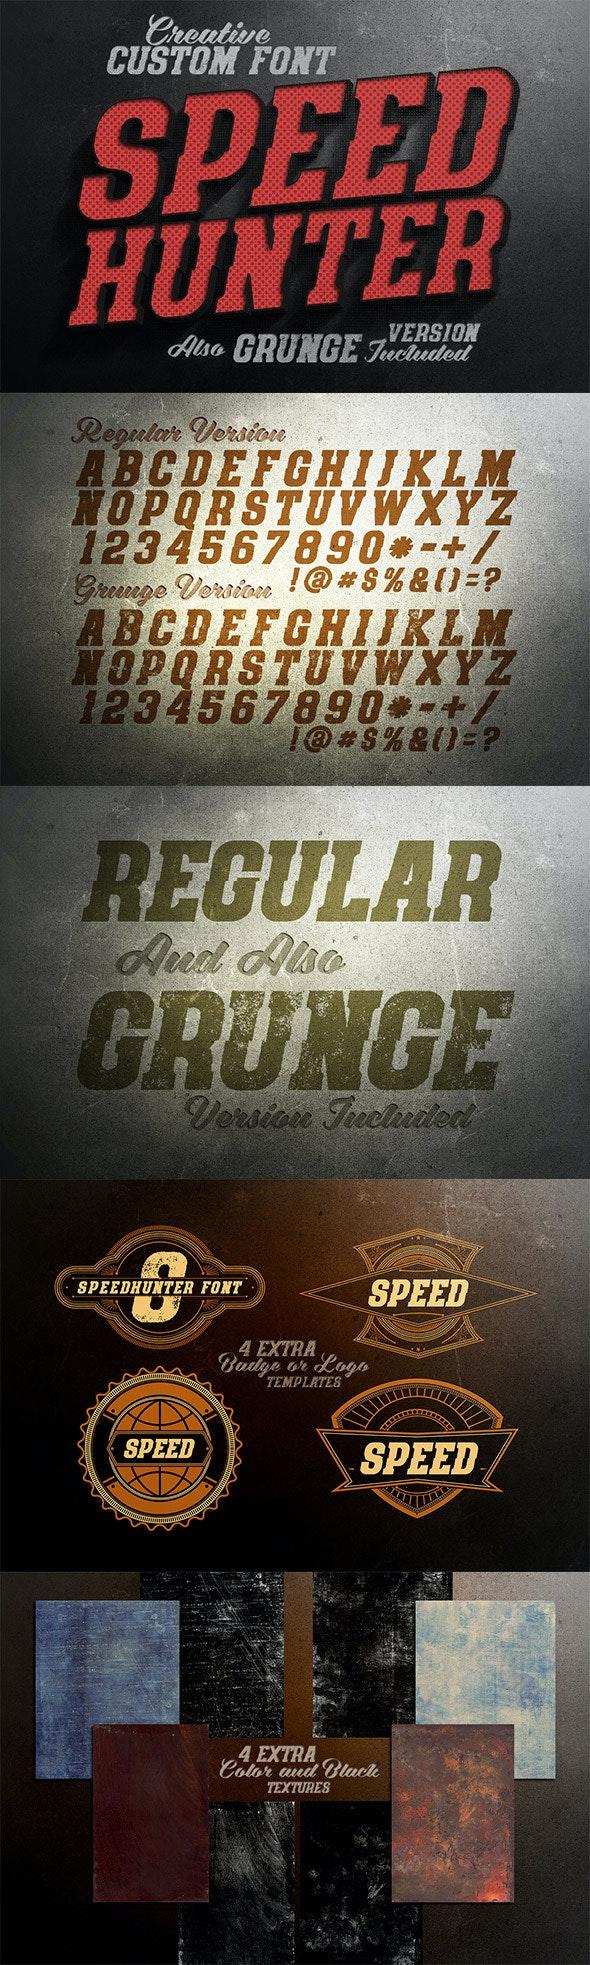 SpeedHunter Custom Font - Miscellaneous Serif